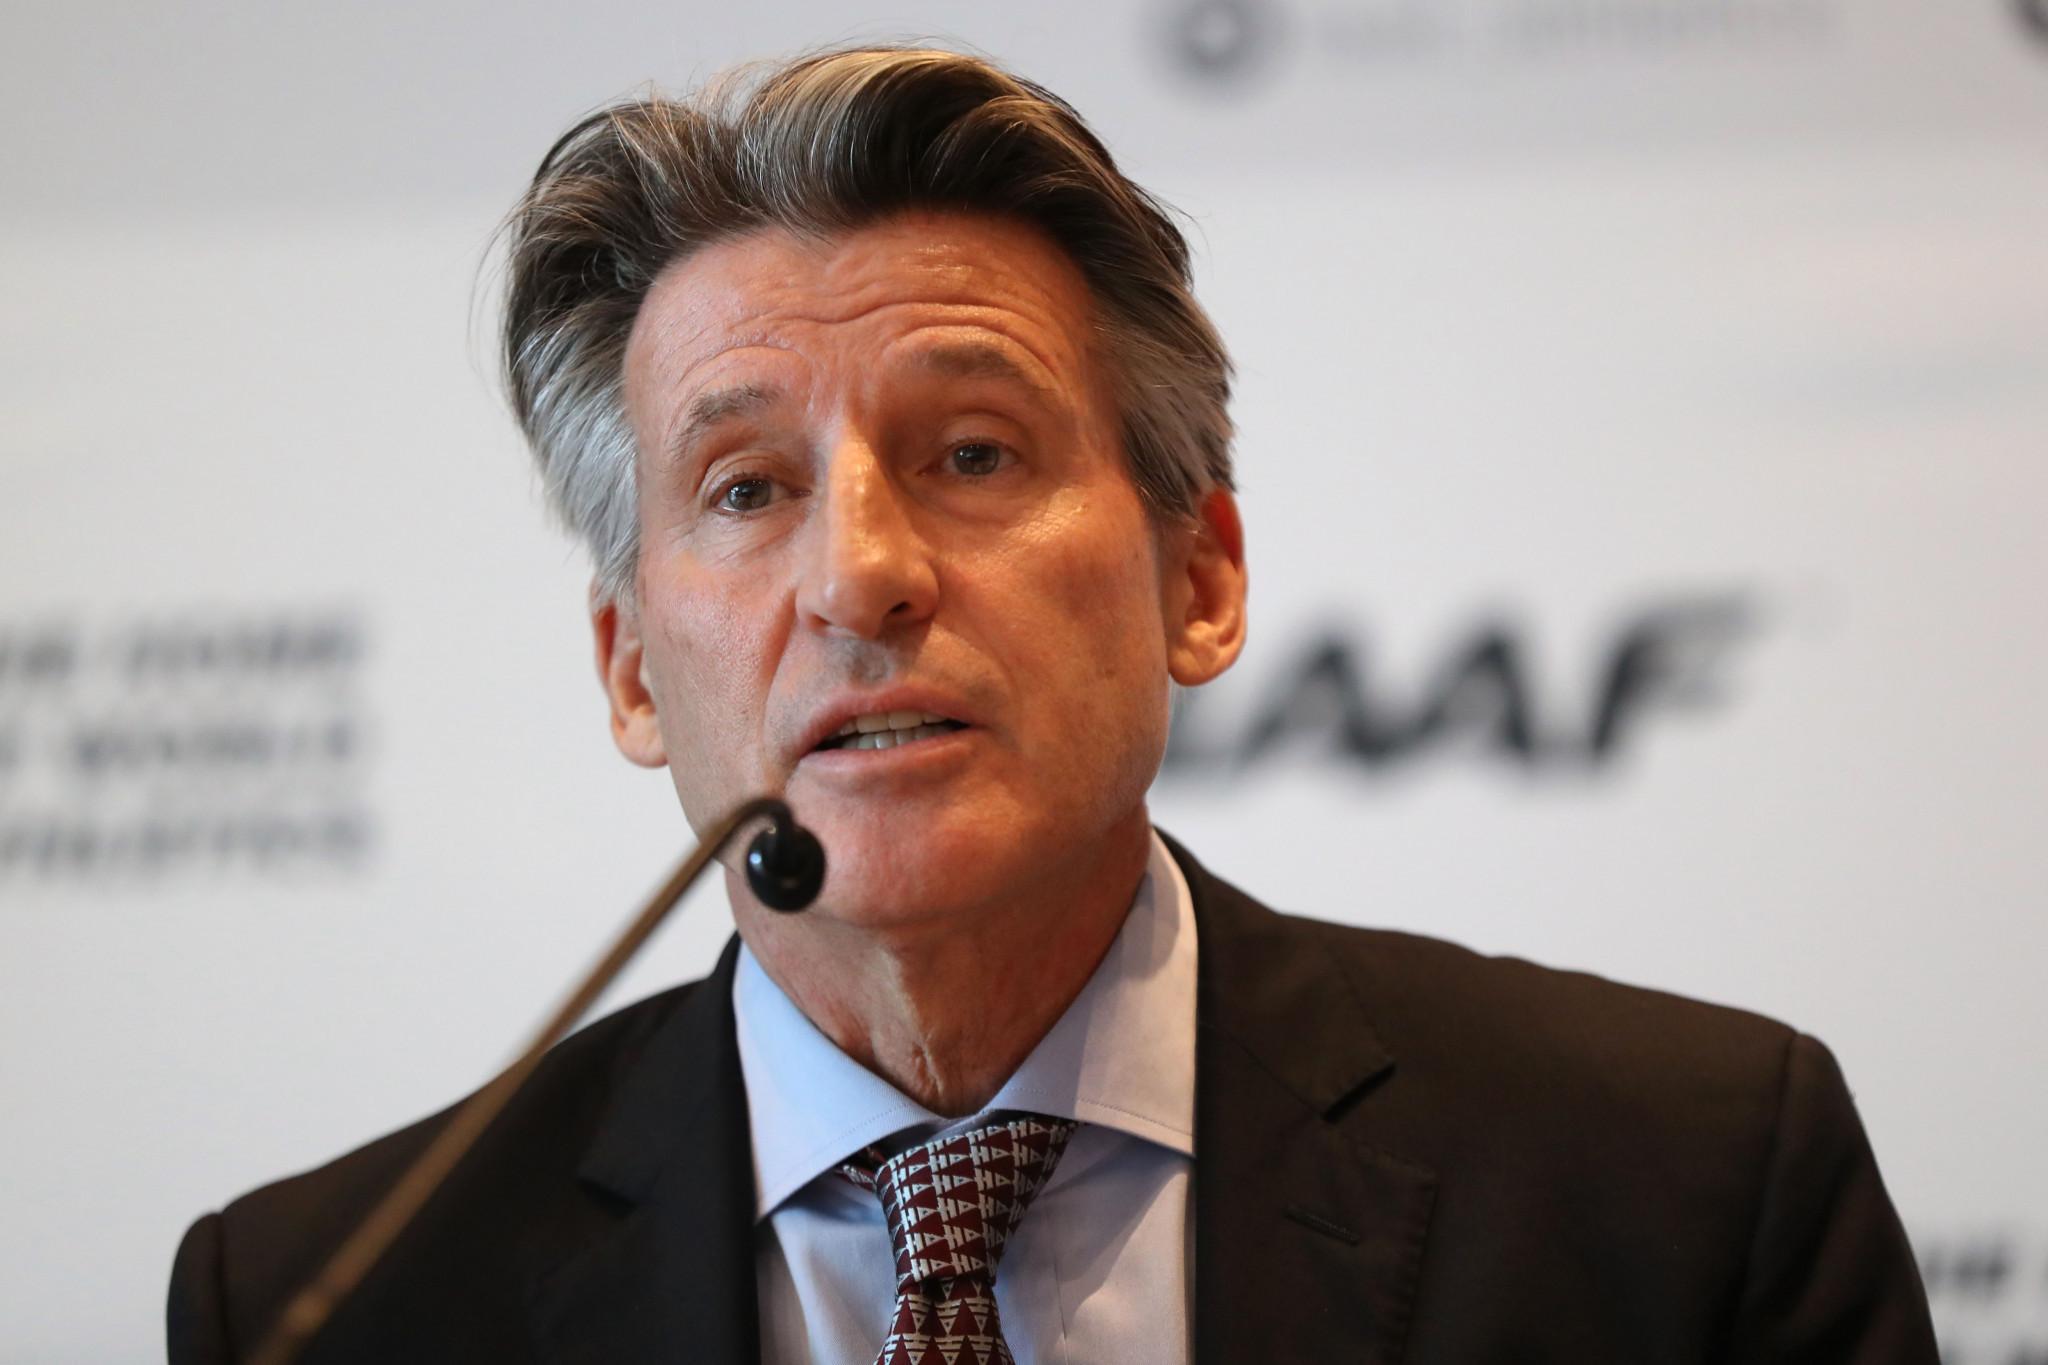 IAAF President Sebastian Coe said he is